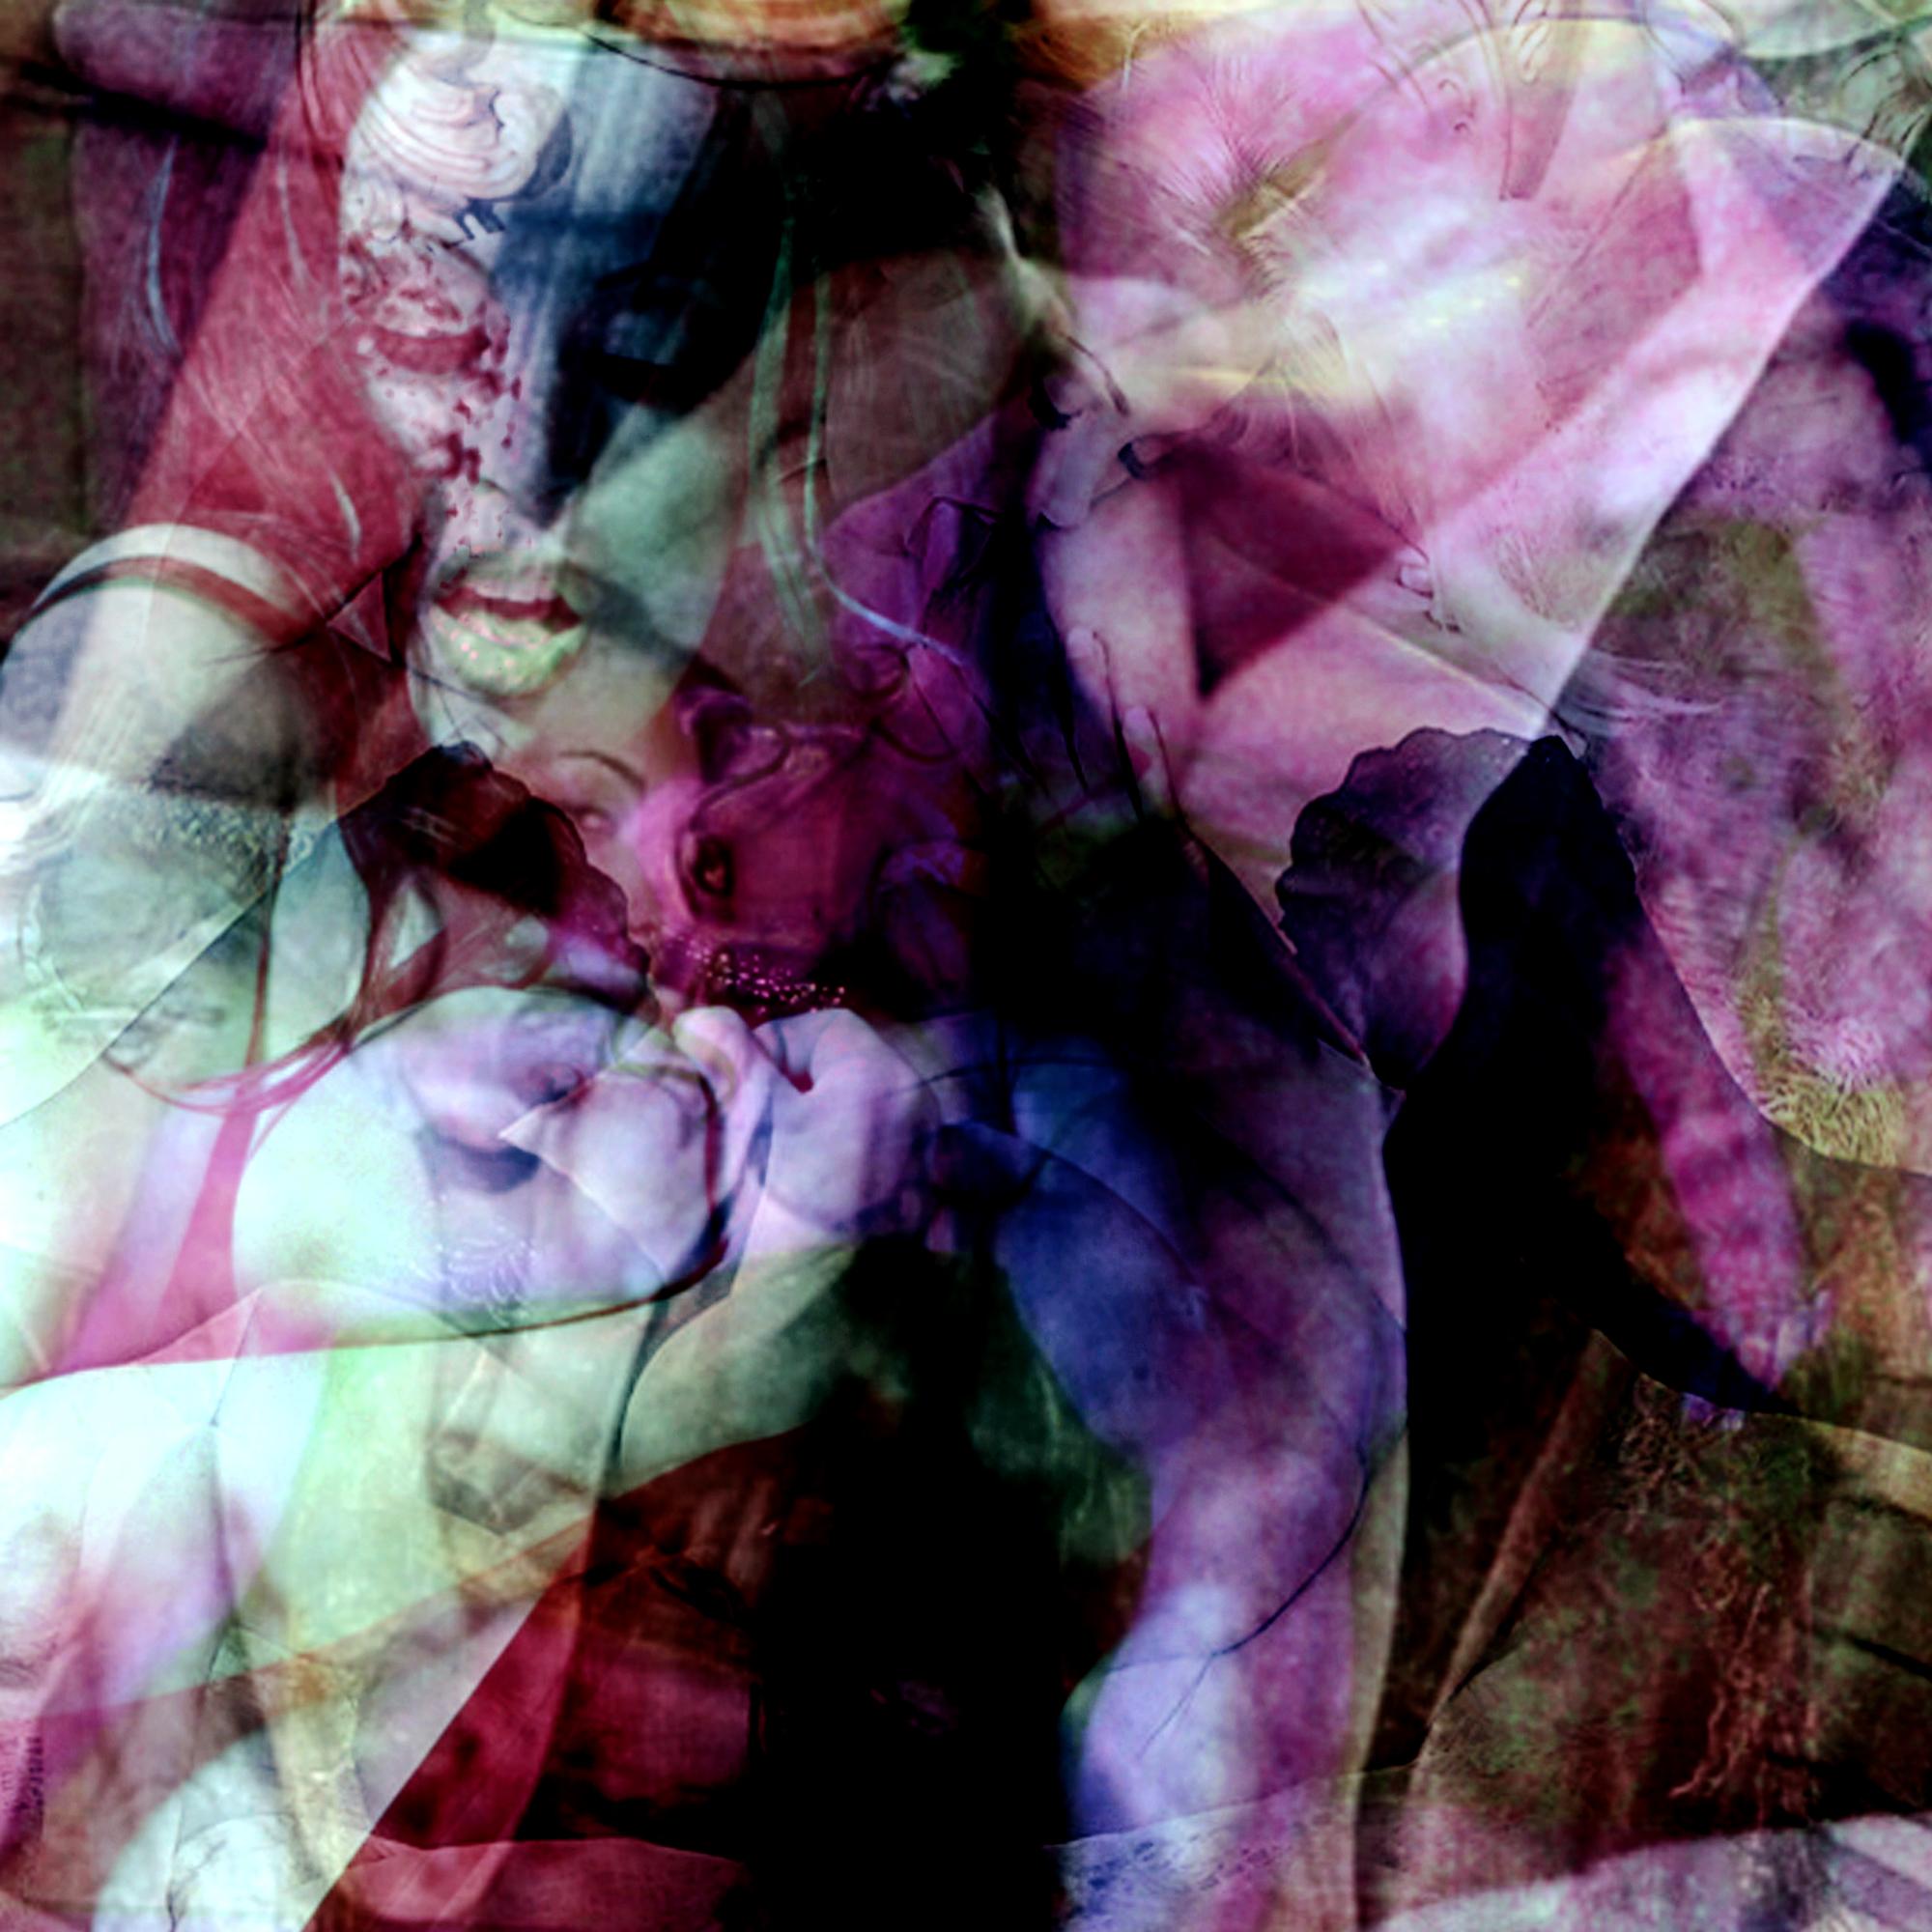 Overdose 02 (Monoptych), 2007